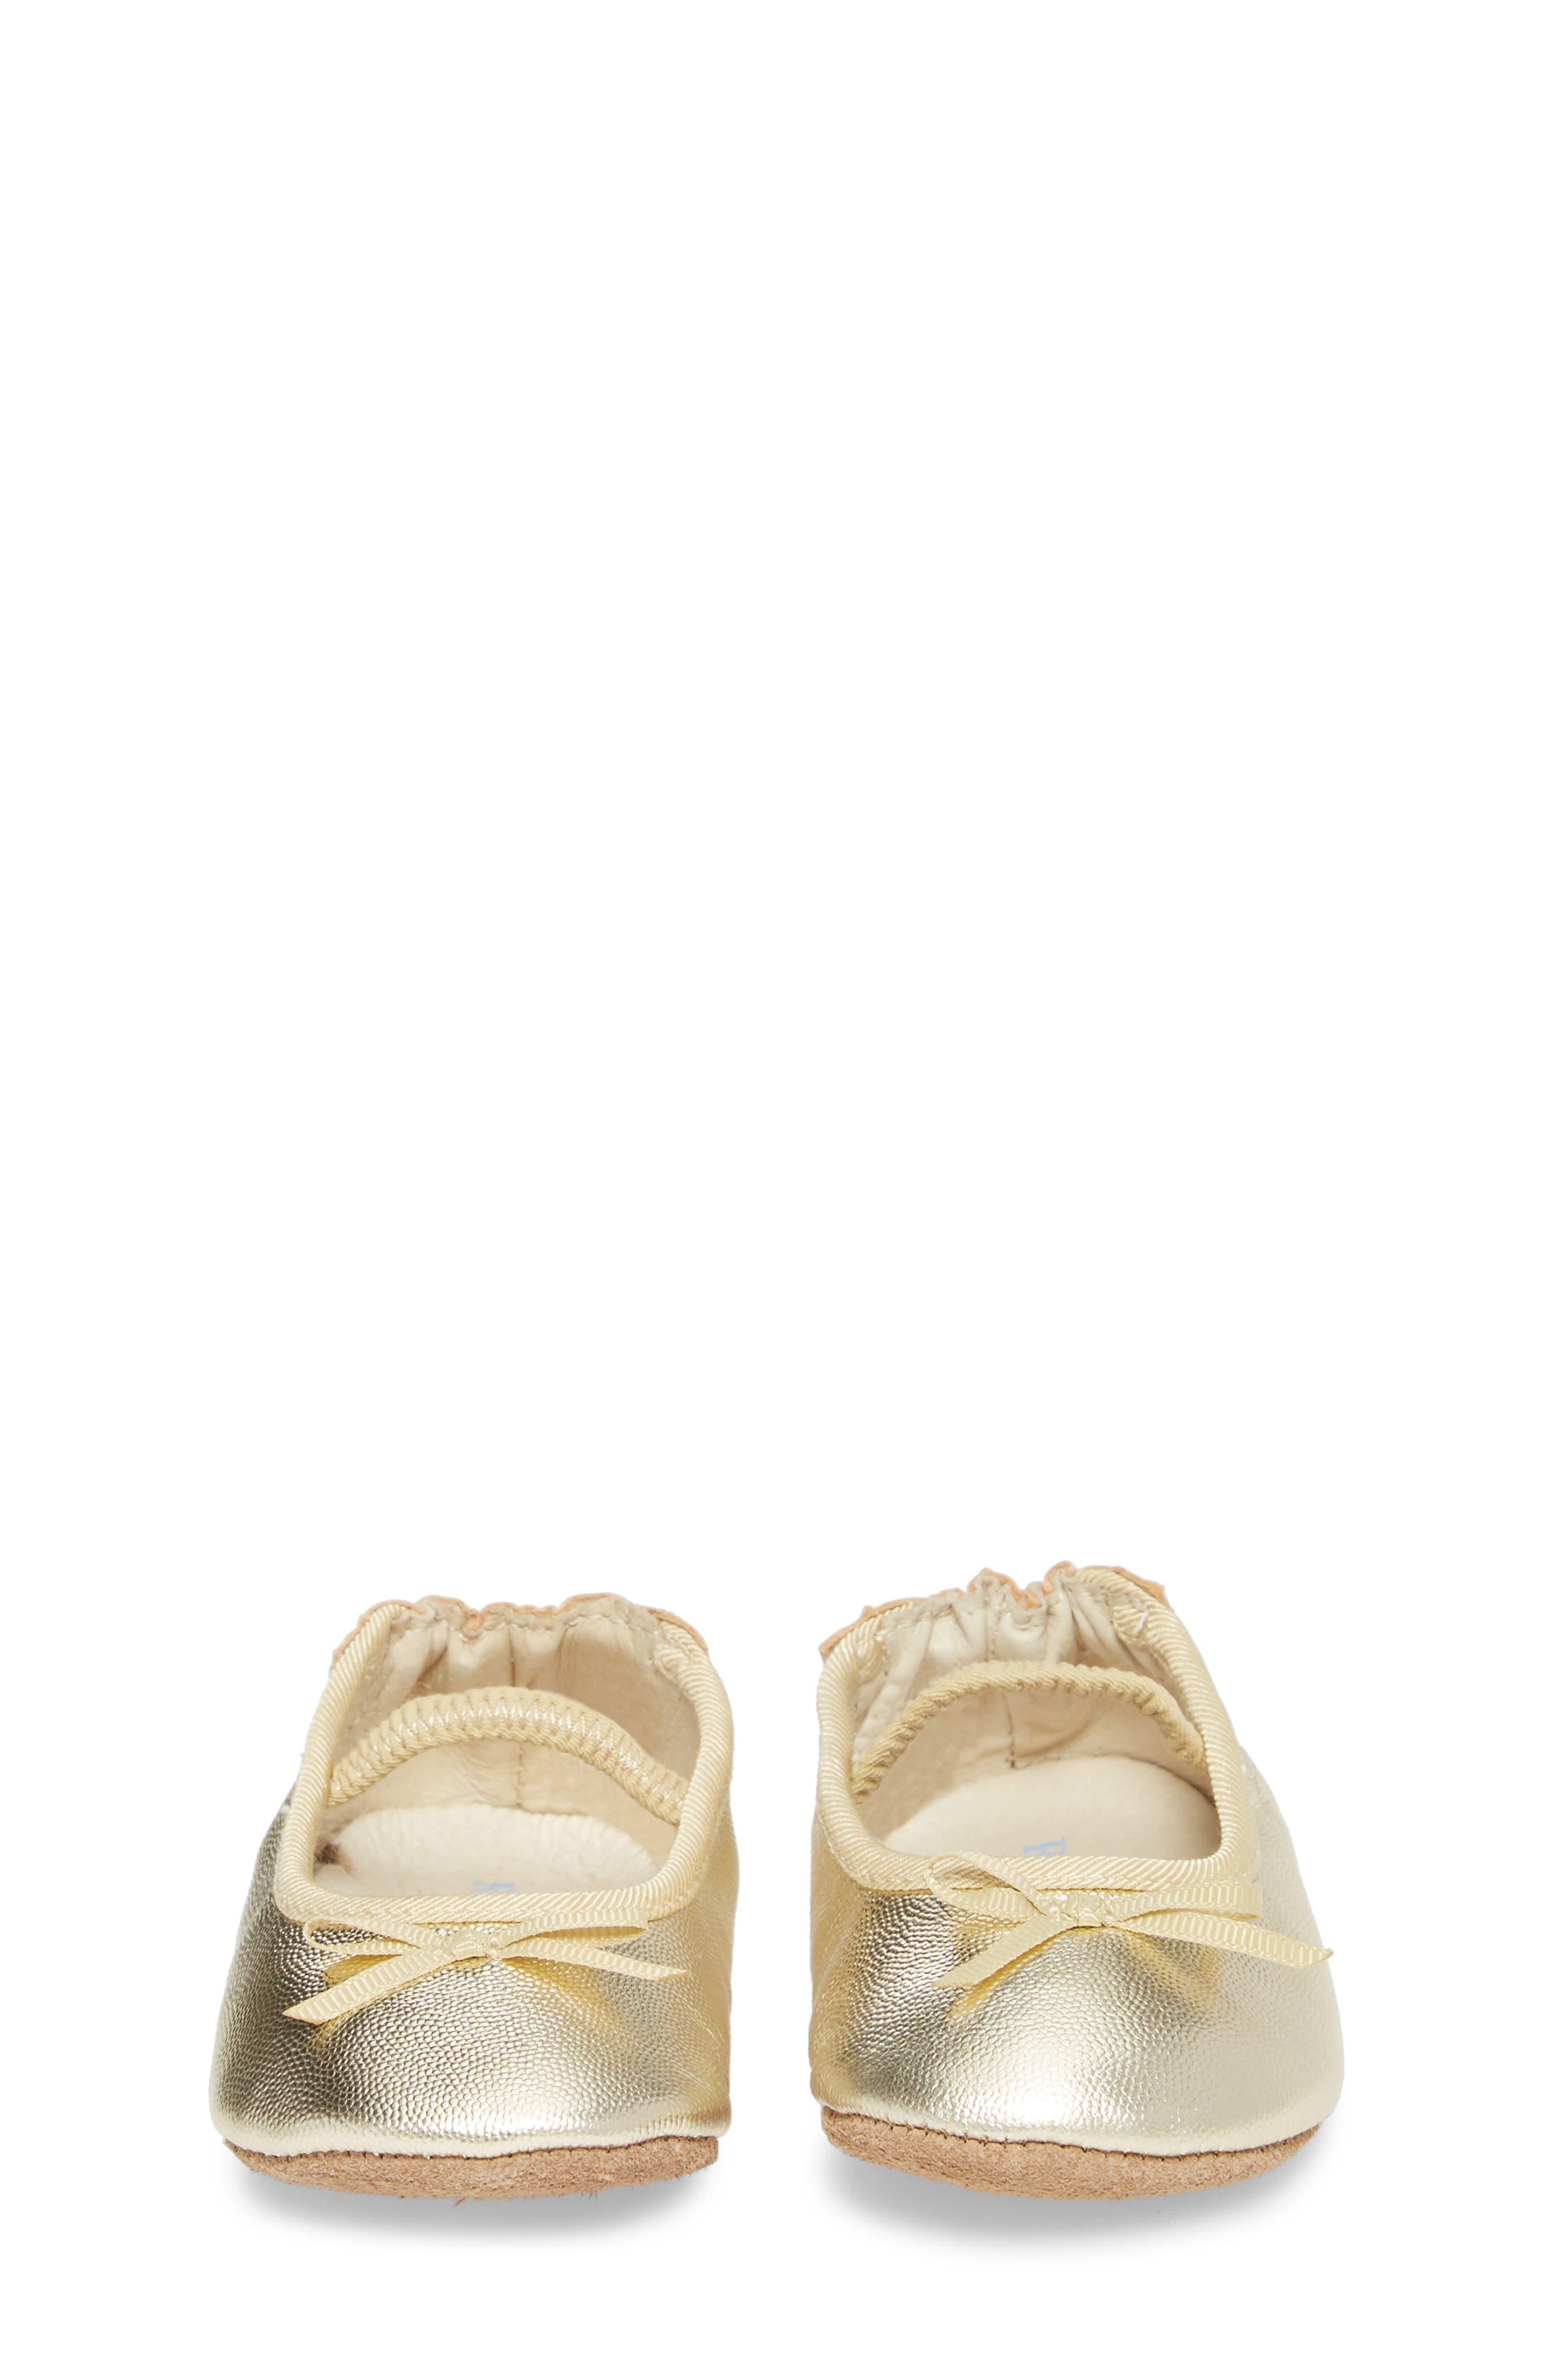 Athena Ballet Strap Crib Shoe,                             Alternate thumbnail 4, color,                             GOLD